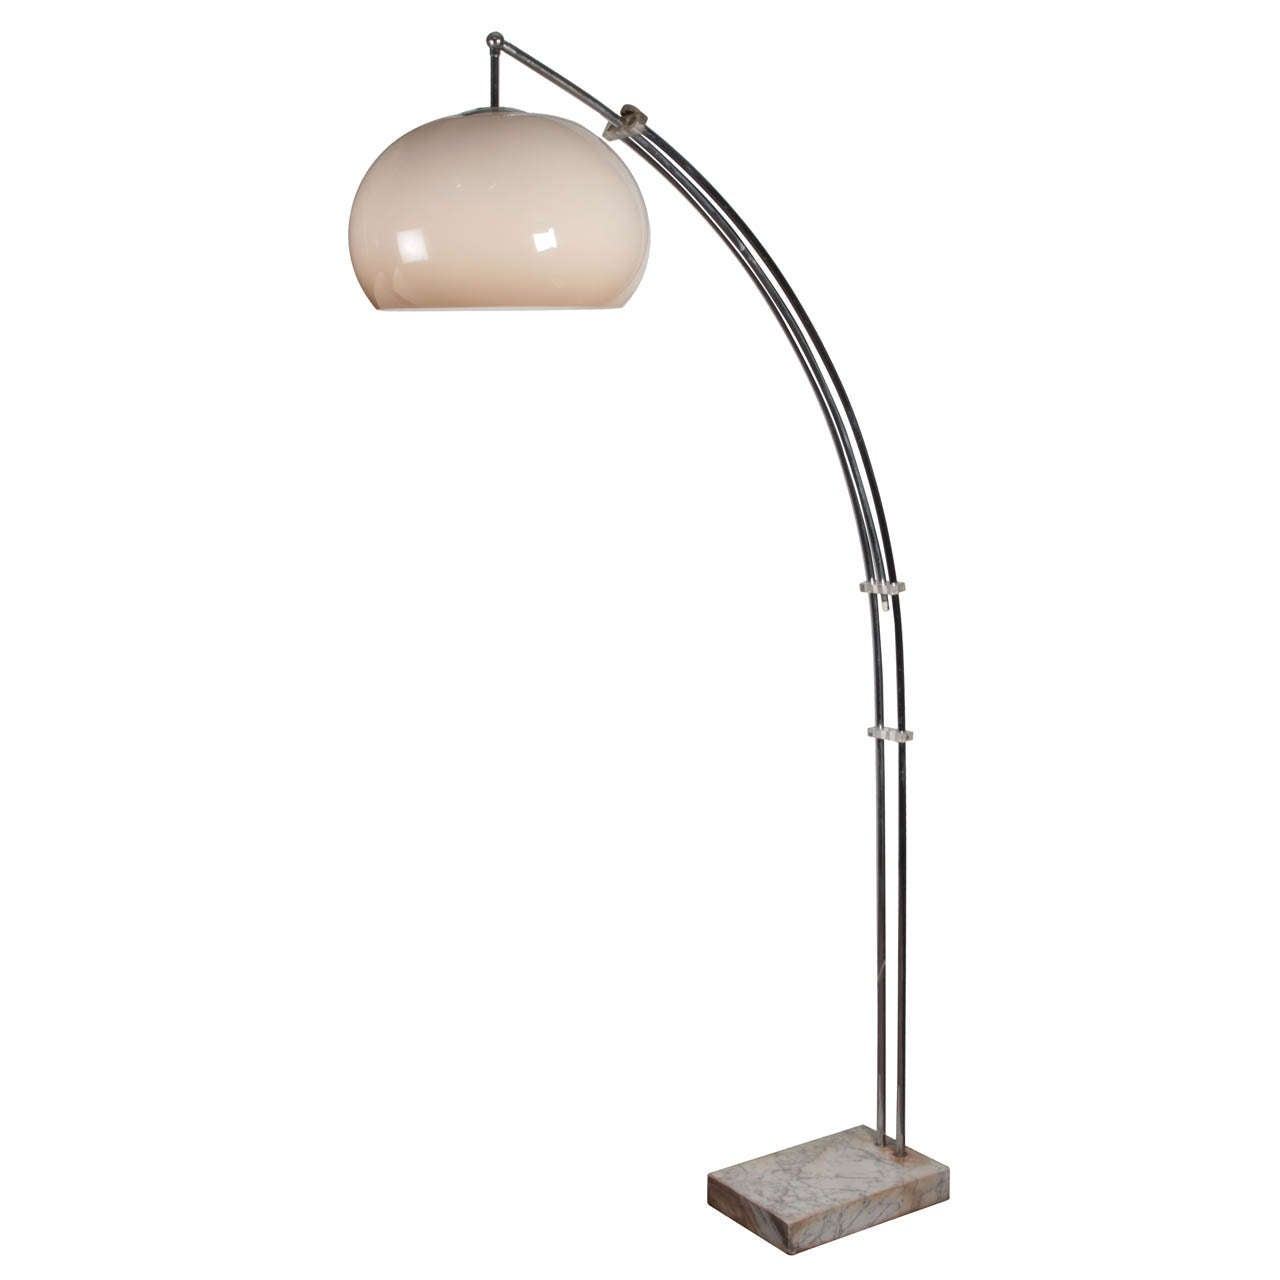 Adjustable Mid Century Arc Floor Lamp With Original Shade